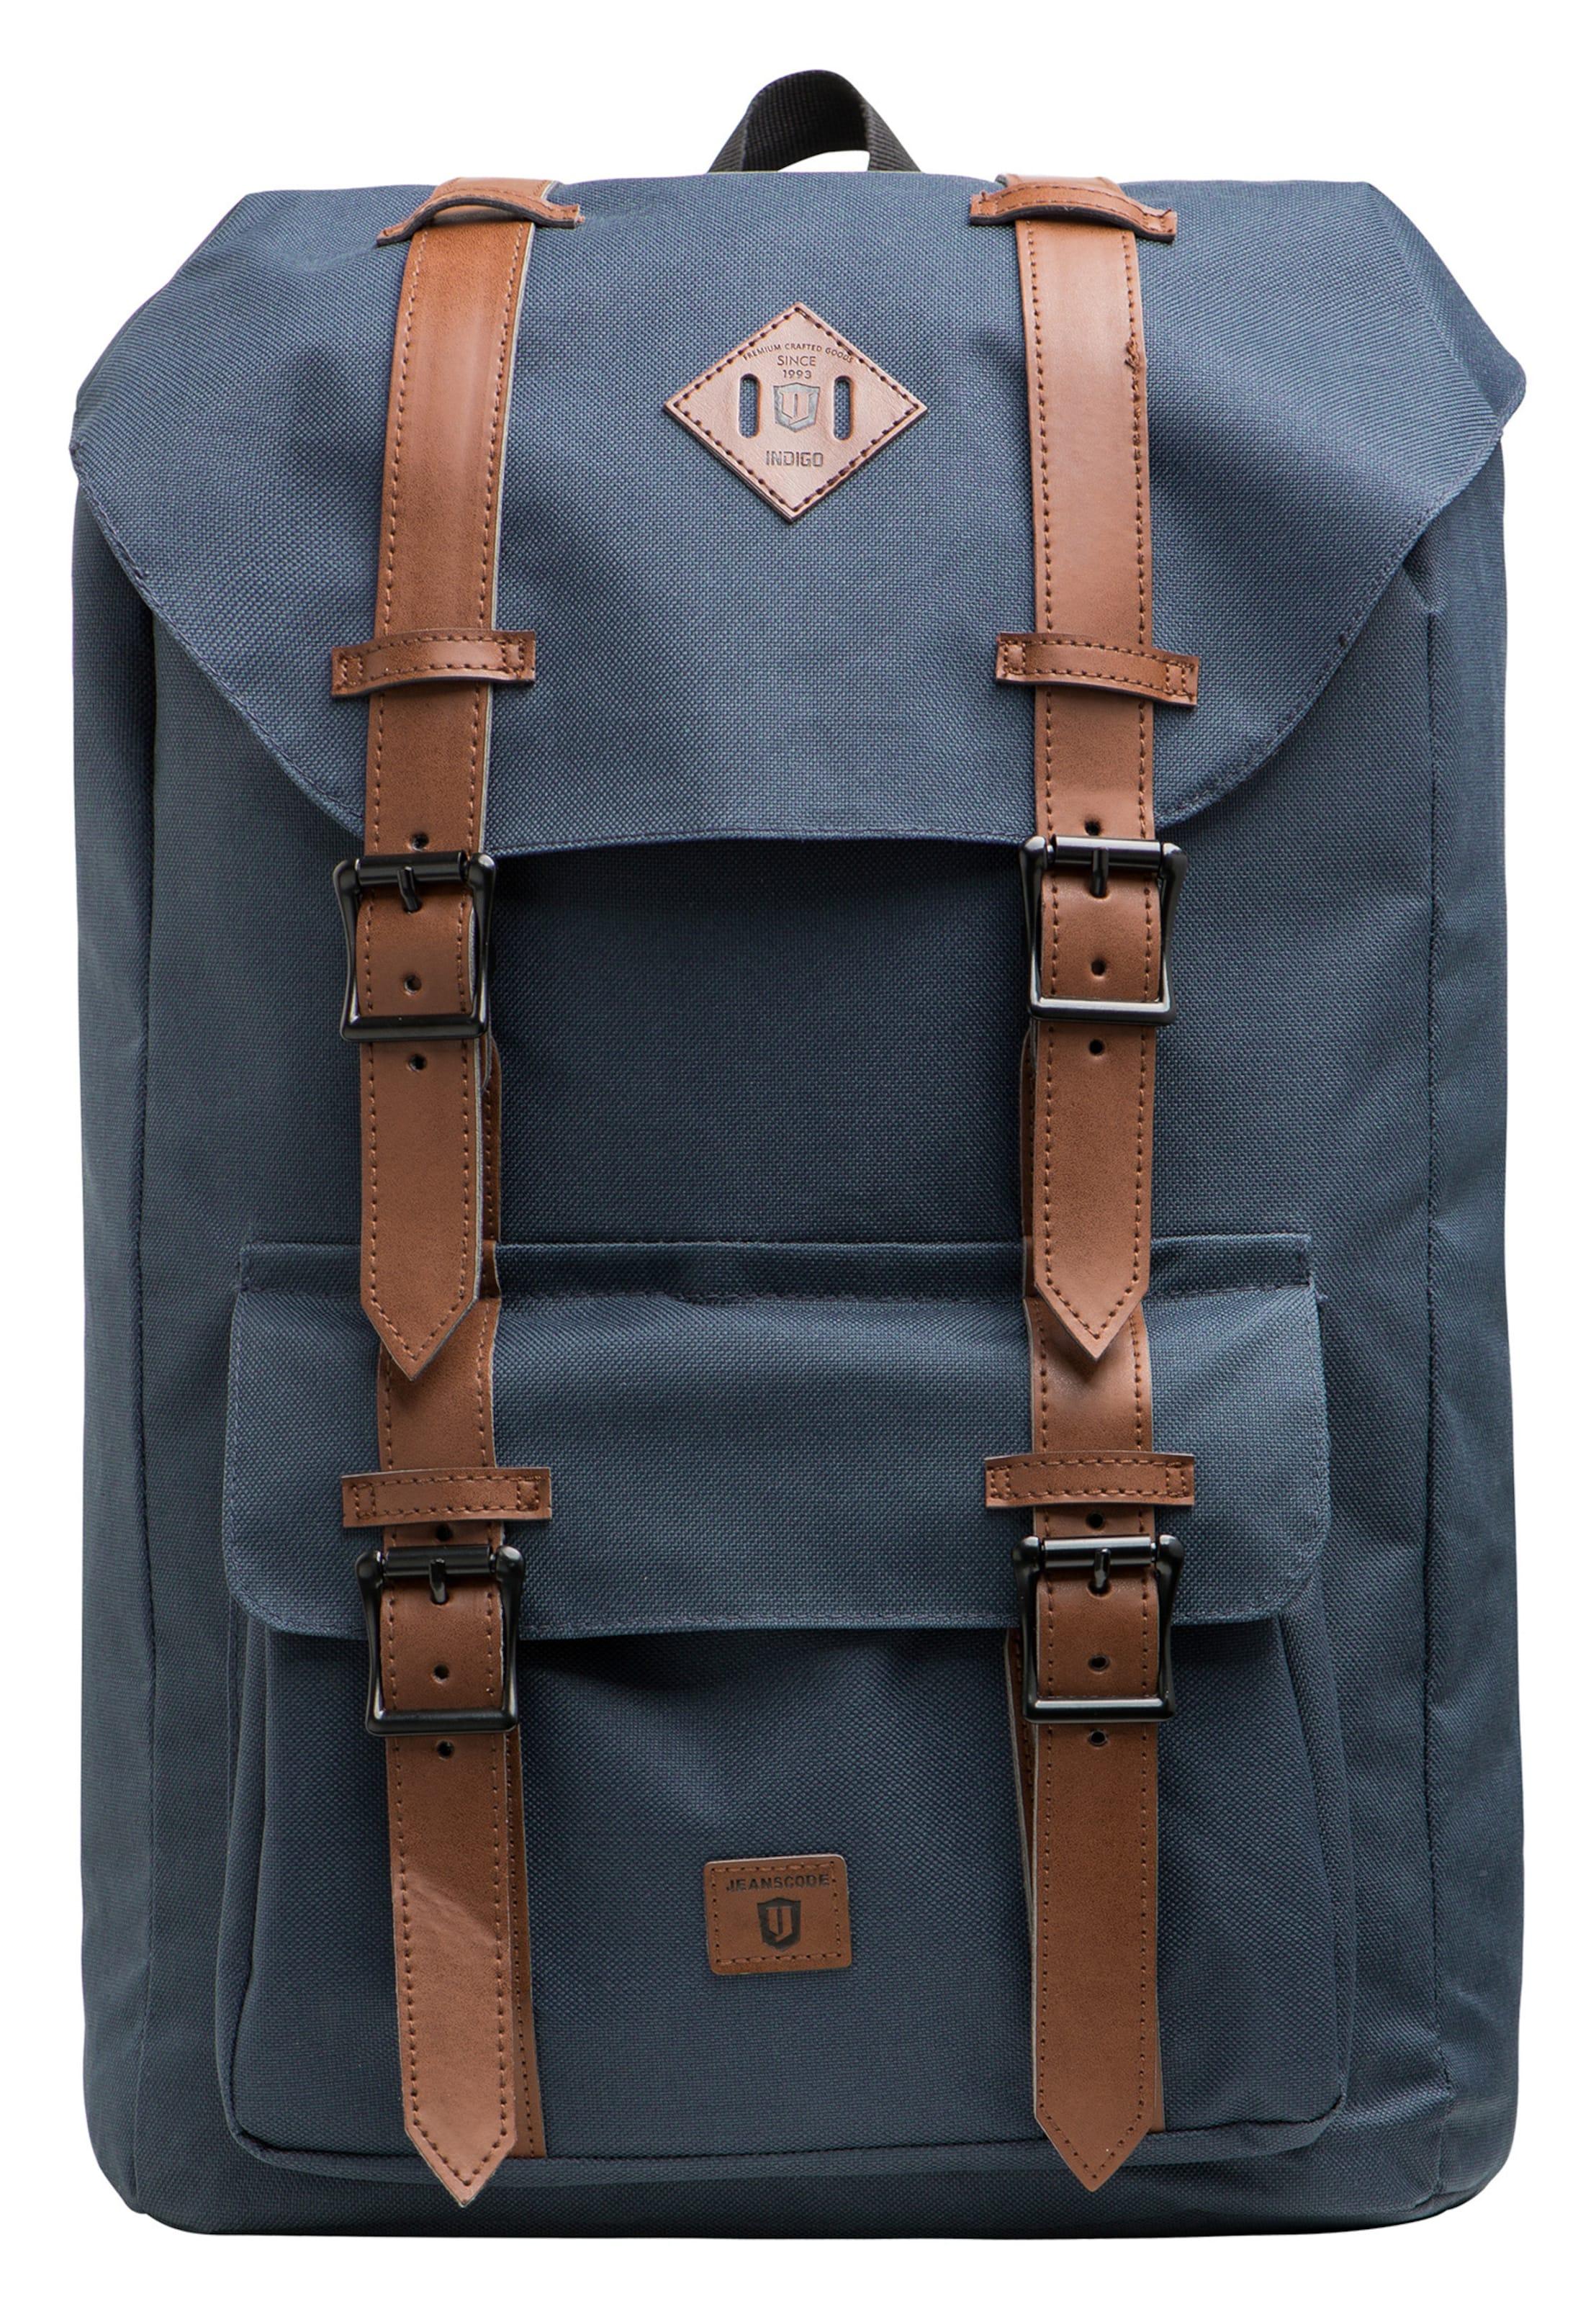 Jeans Backpack In Indicode 'heiss' BraunGraumeliert P8nZwO0NkX